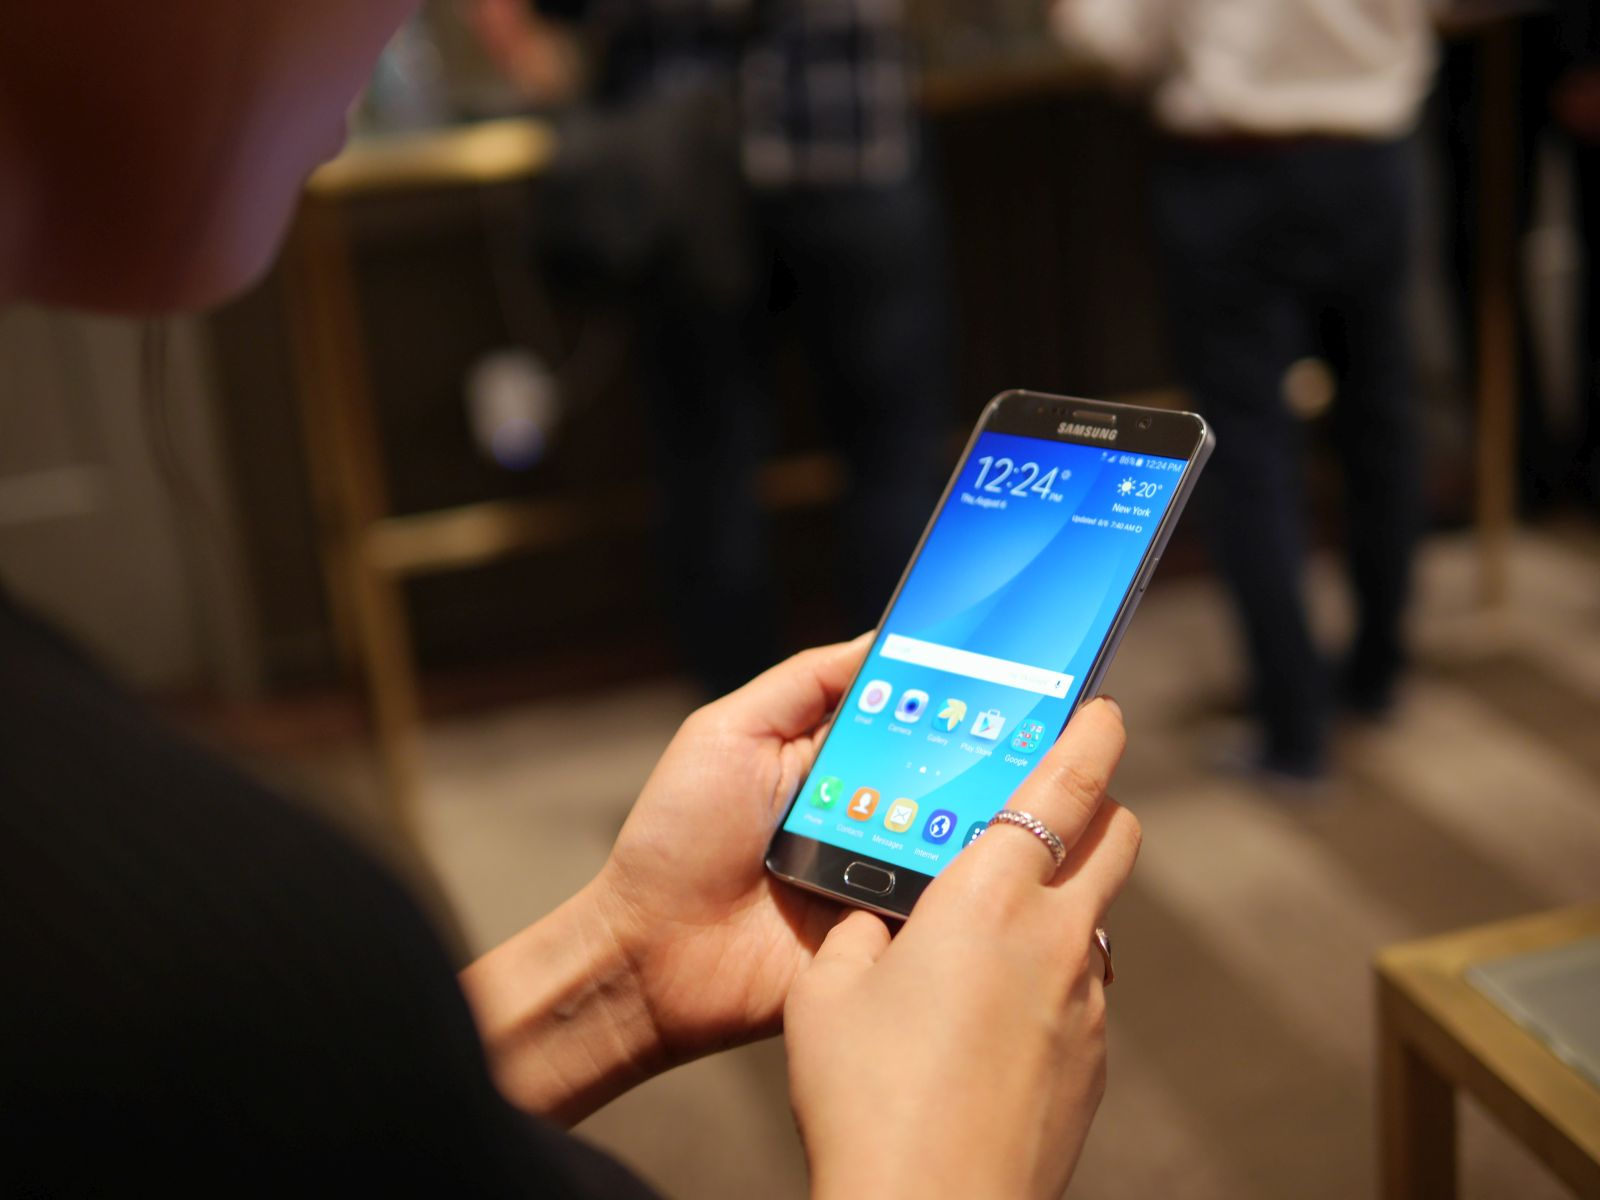 Samsung Galaxy S6 edge Plus 02